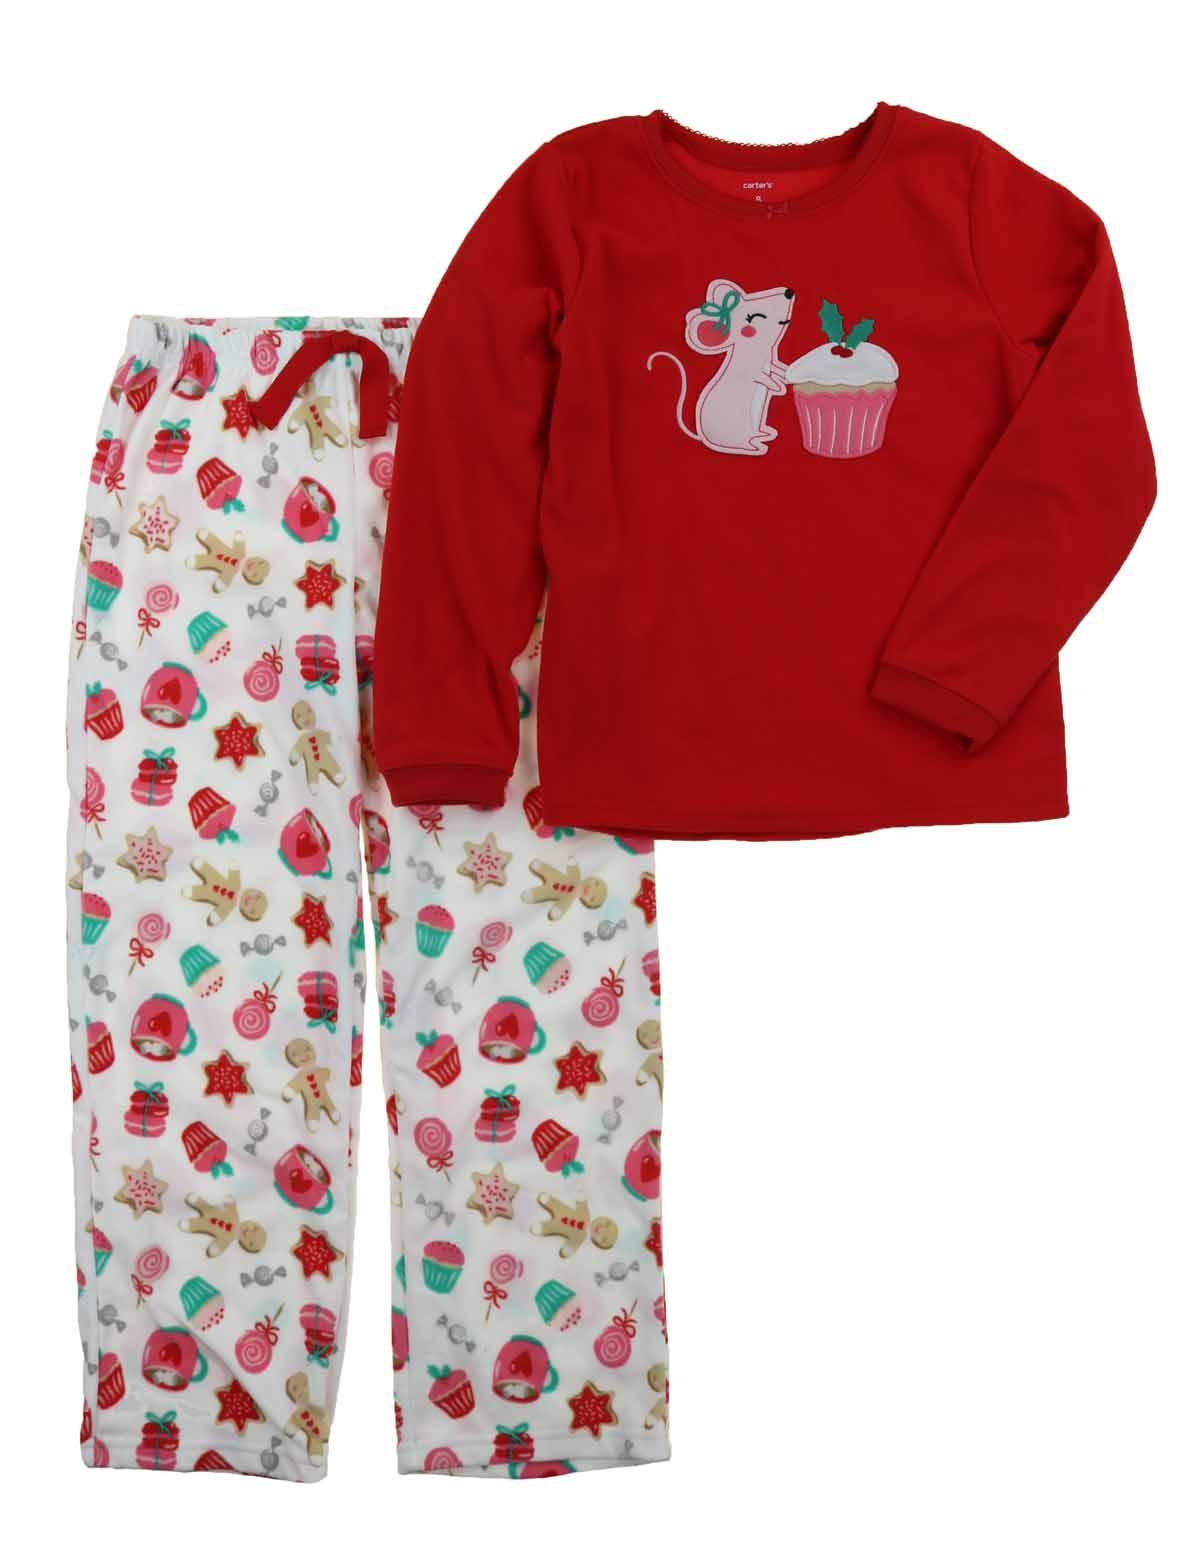 e8cc1df205 Carters Girls 2 Piece Pajamas Shirt and Pant Sleepwear